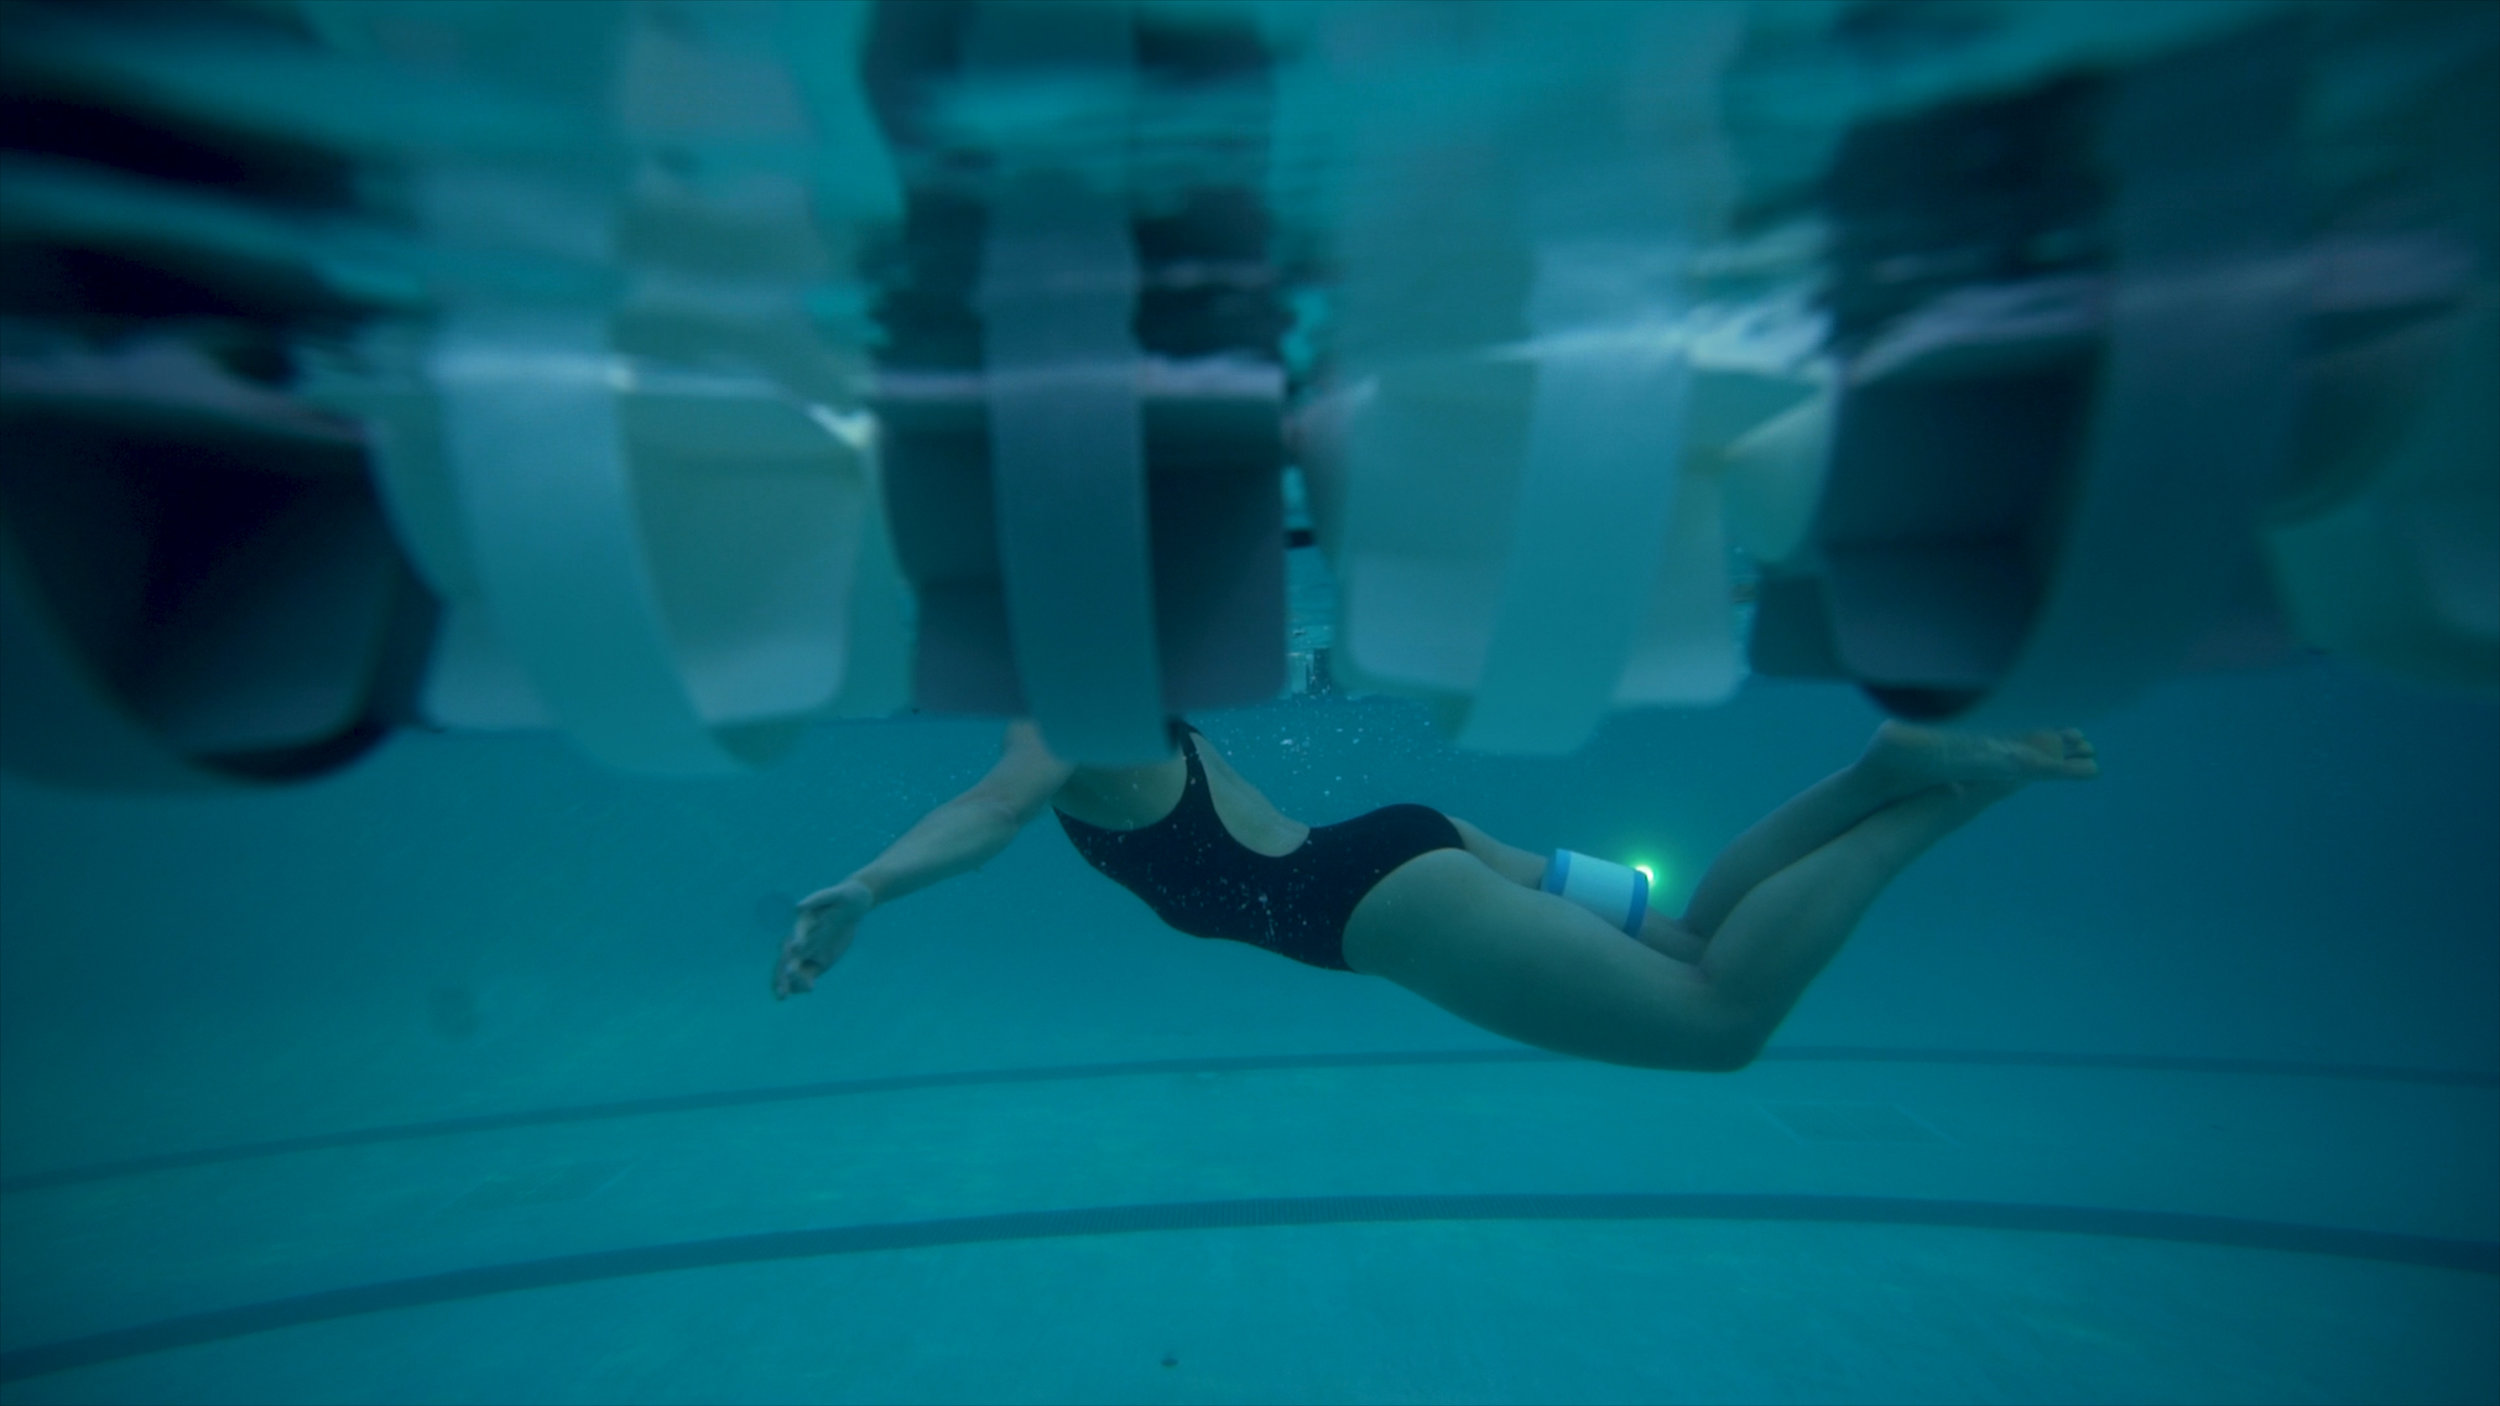 Seeking Growth: Dancers As Athletes